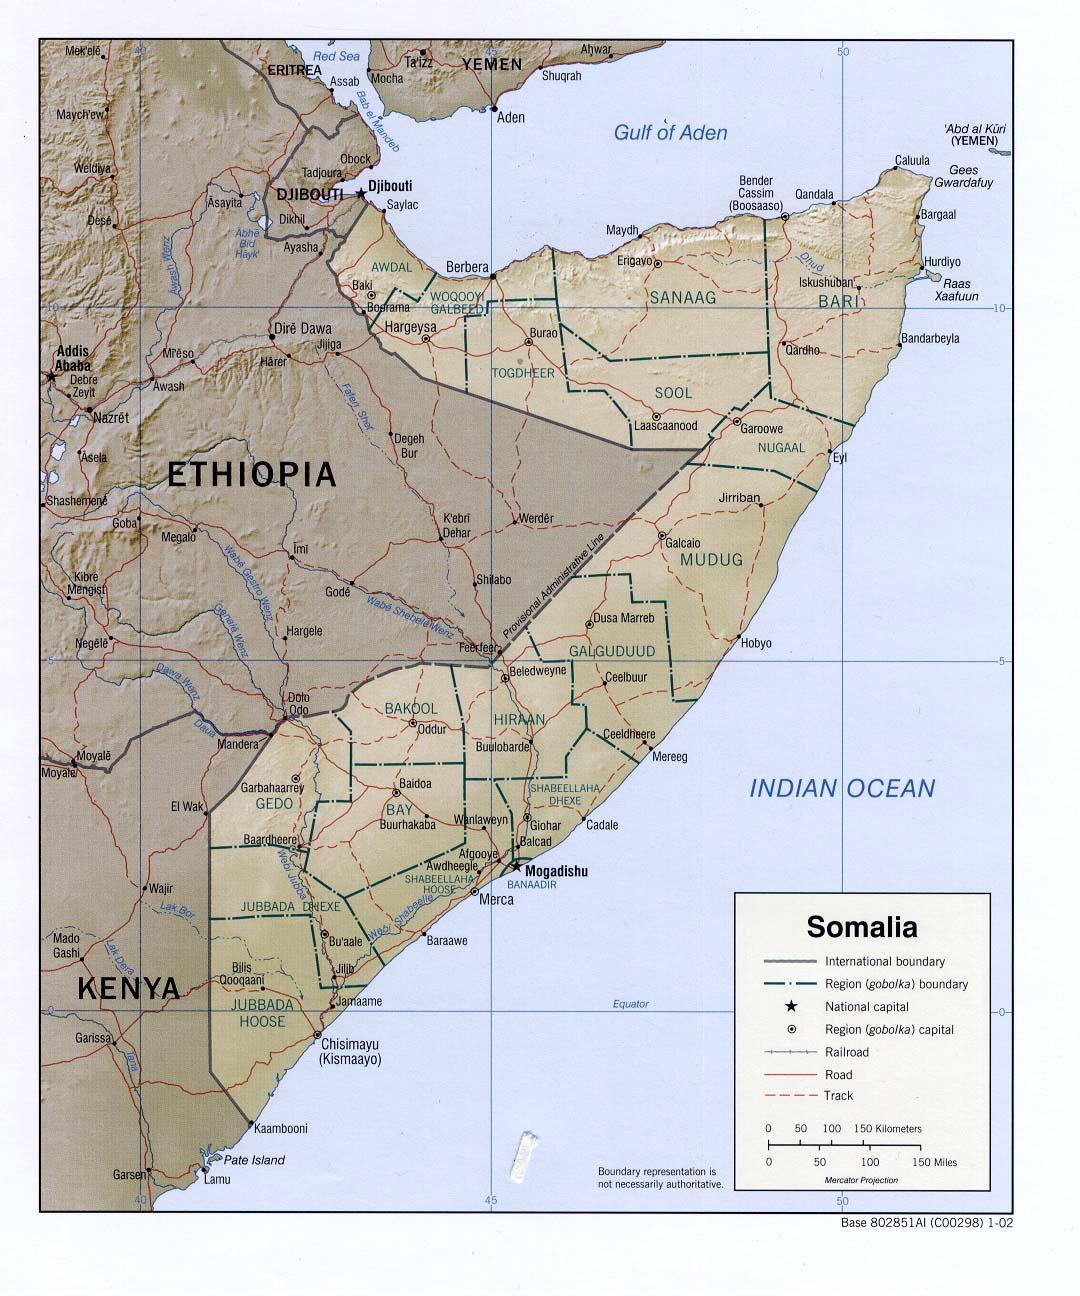 Somaila